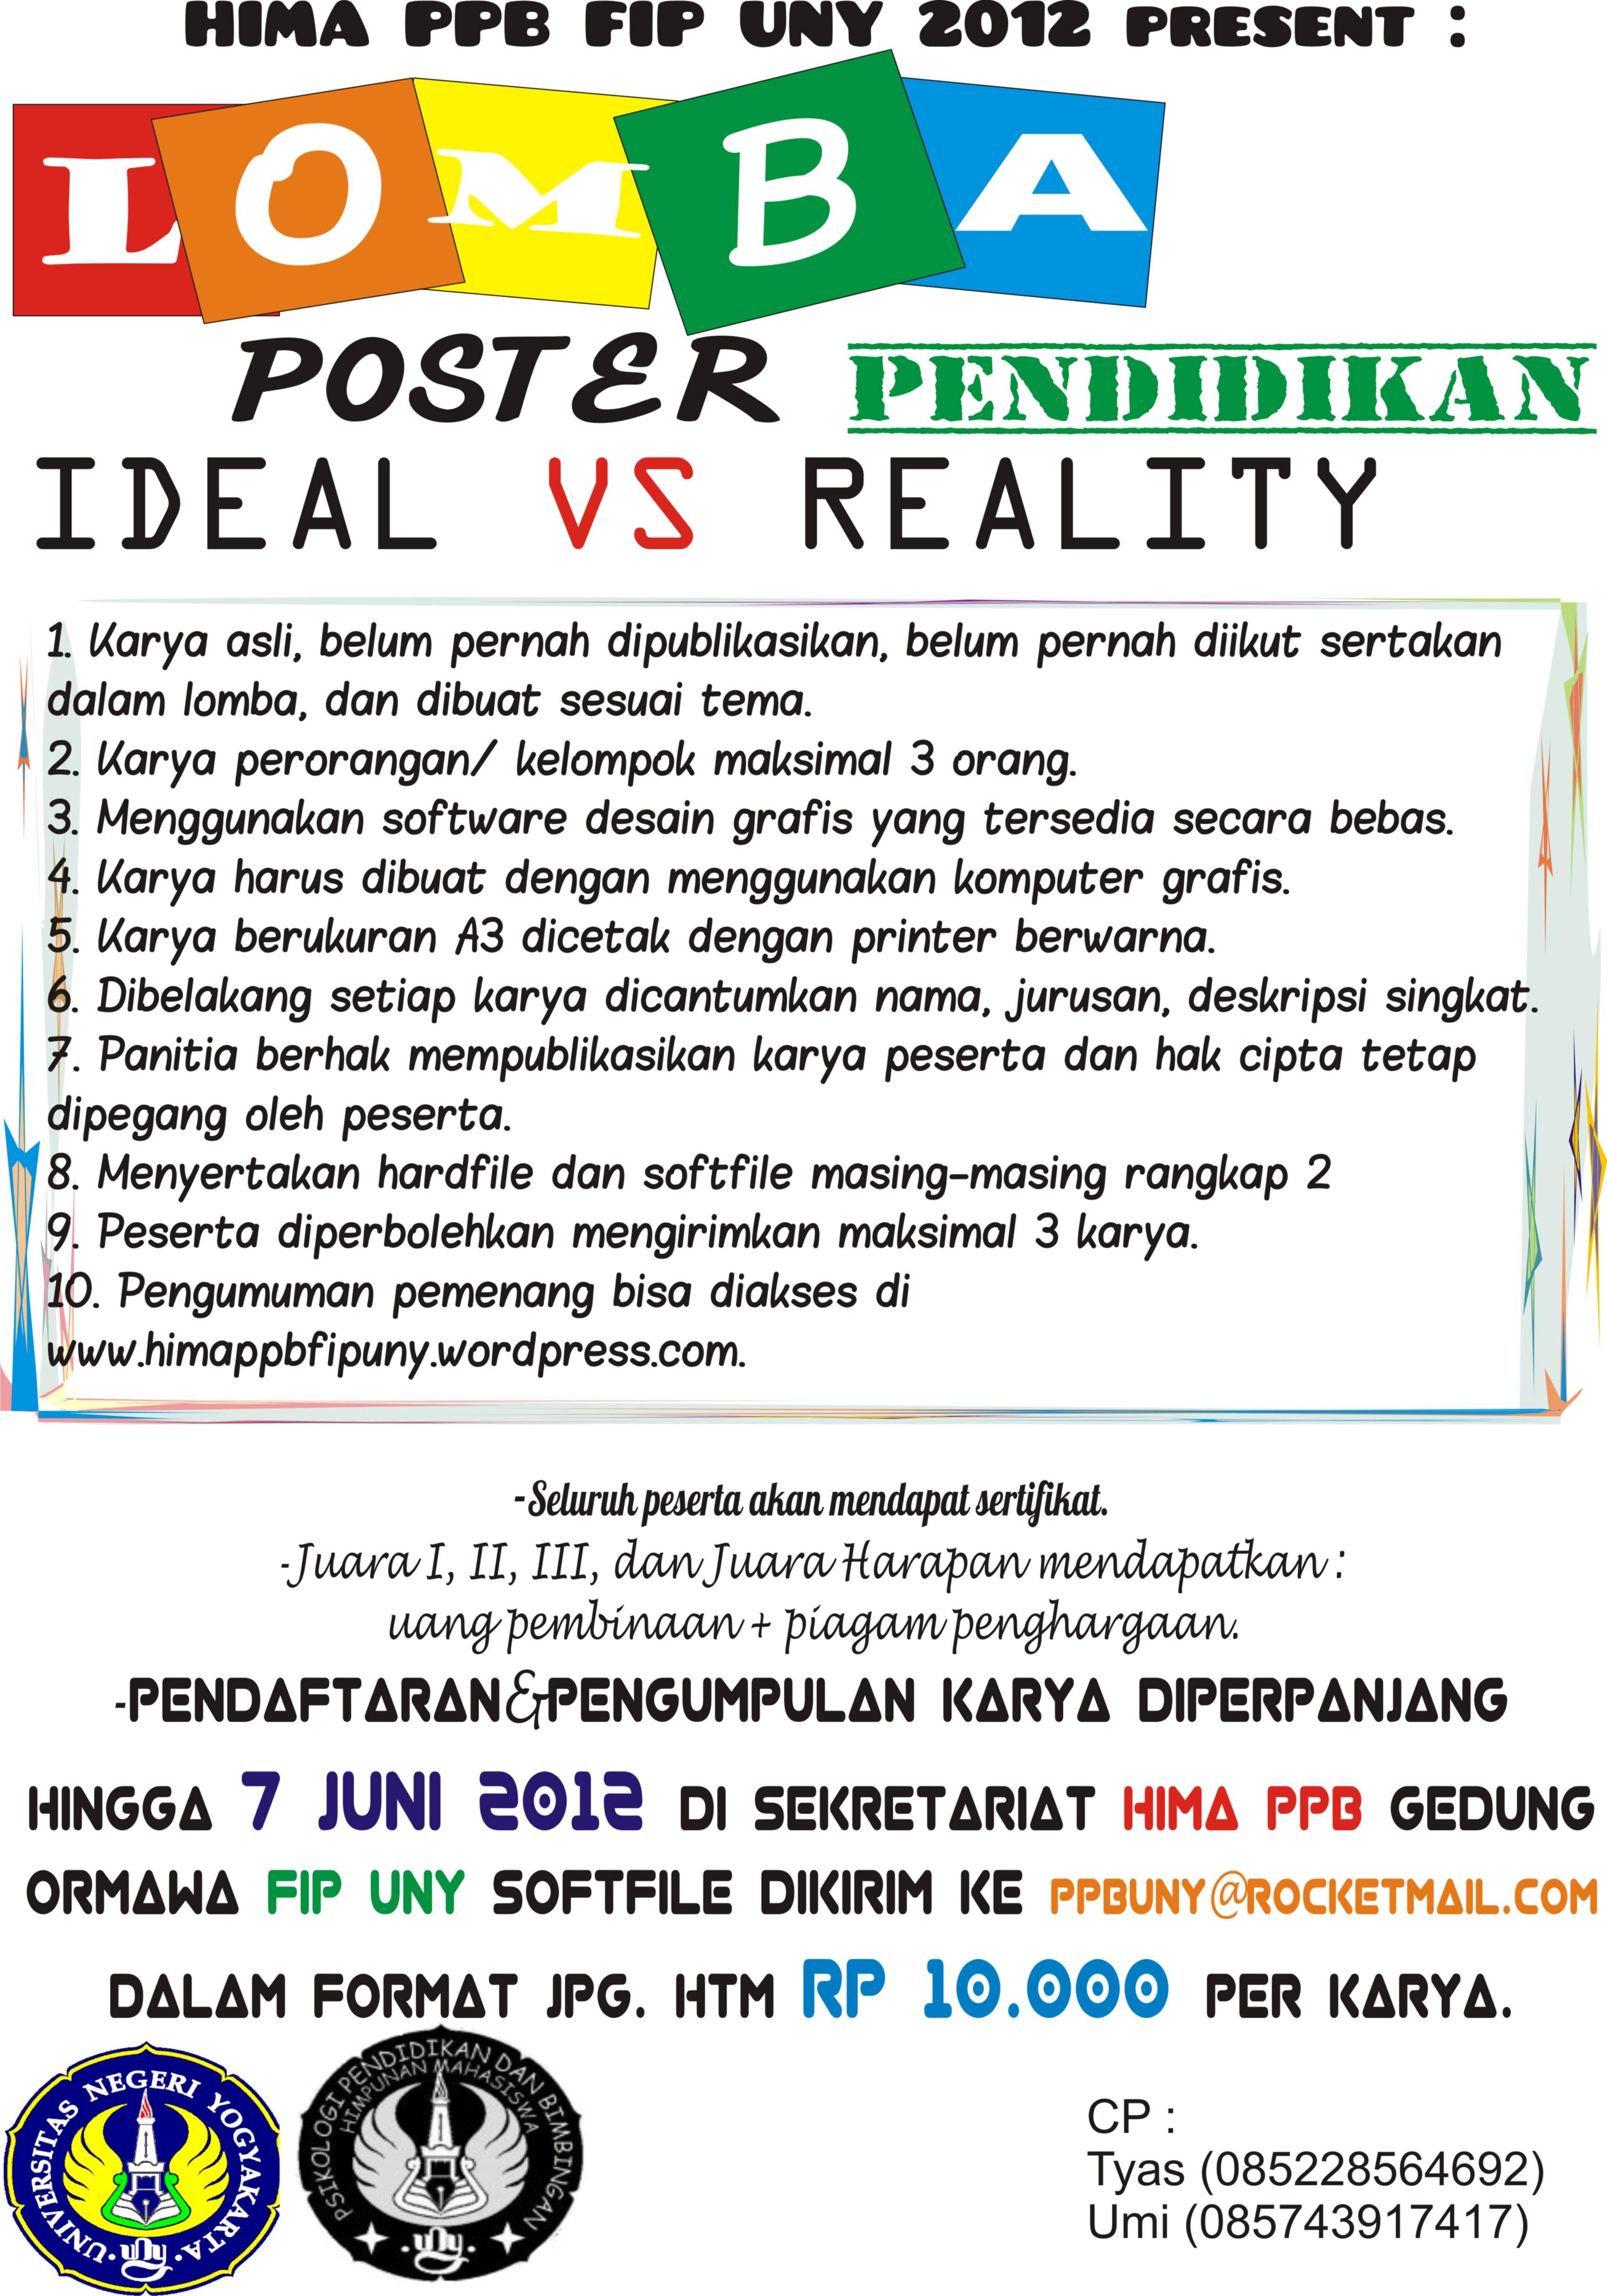 Lomba Poster Pendidikan Se Universitas Negeri Yogyakarta